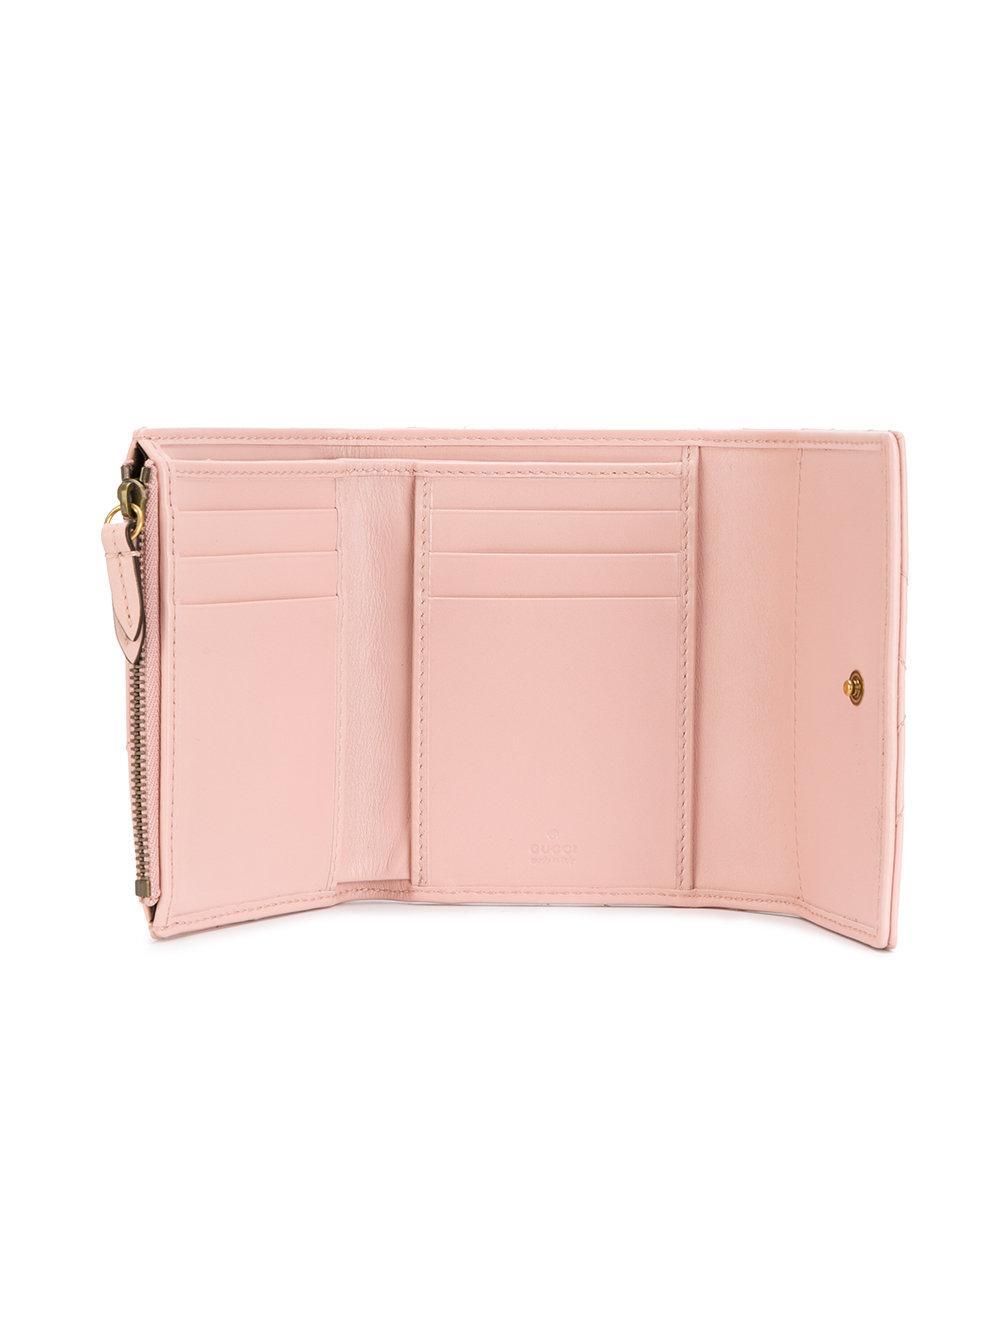 23736d6519b Lyst - Gucci Gg Marmont Matelassé Wallet in Pink